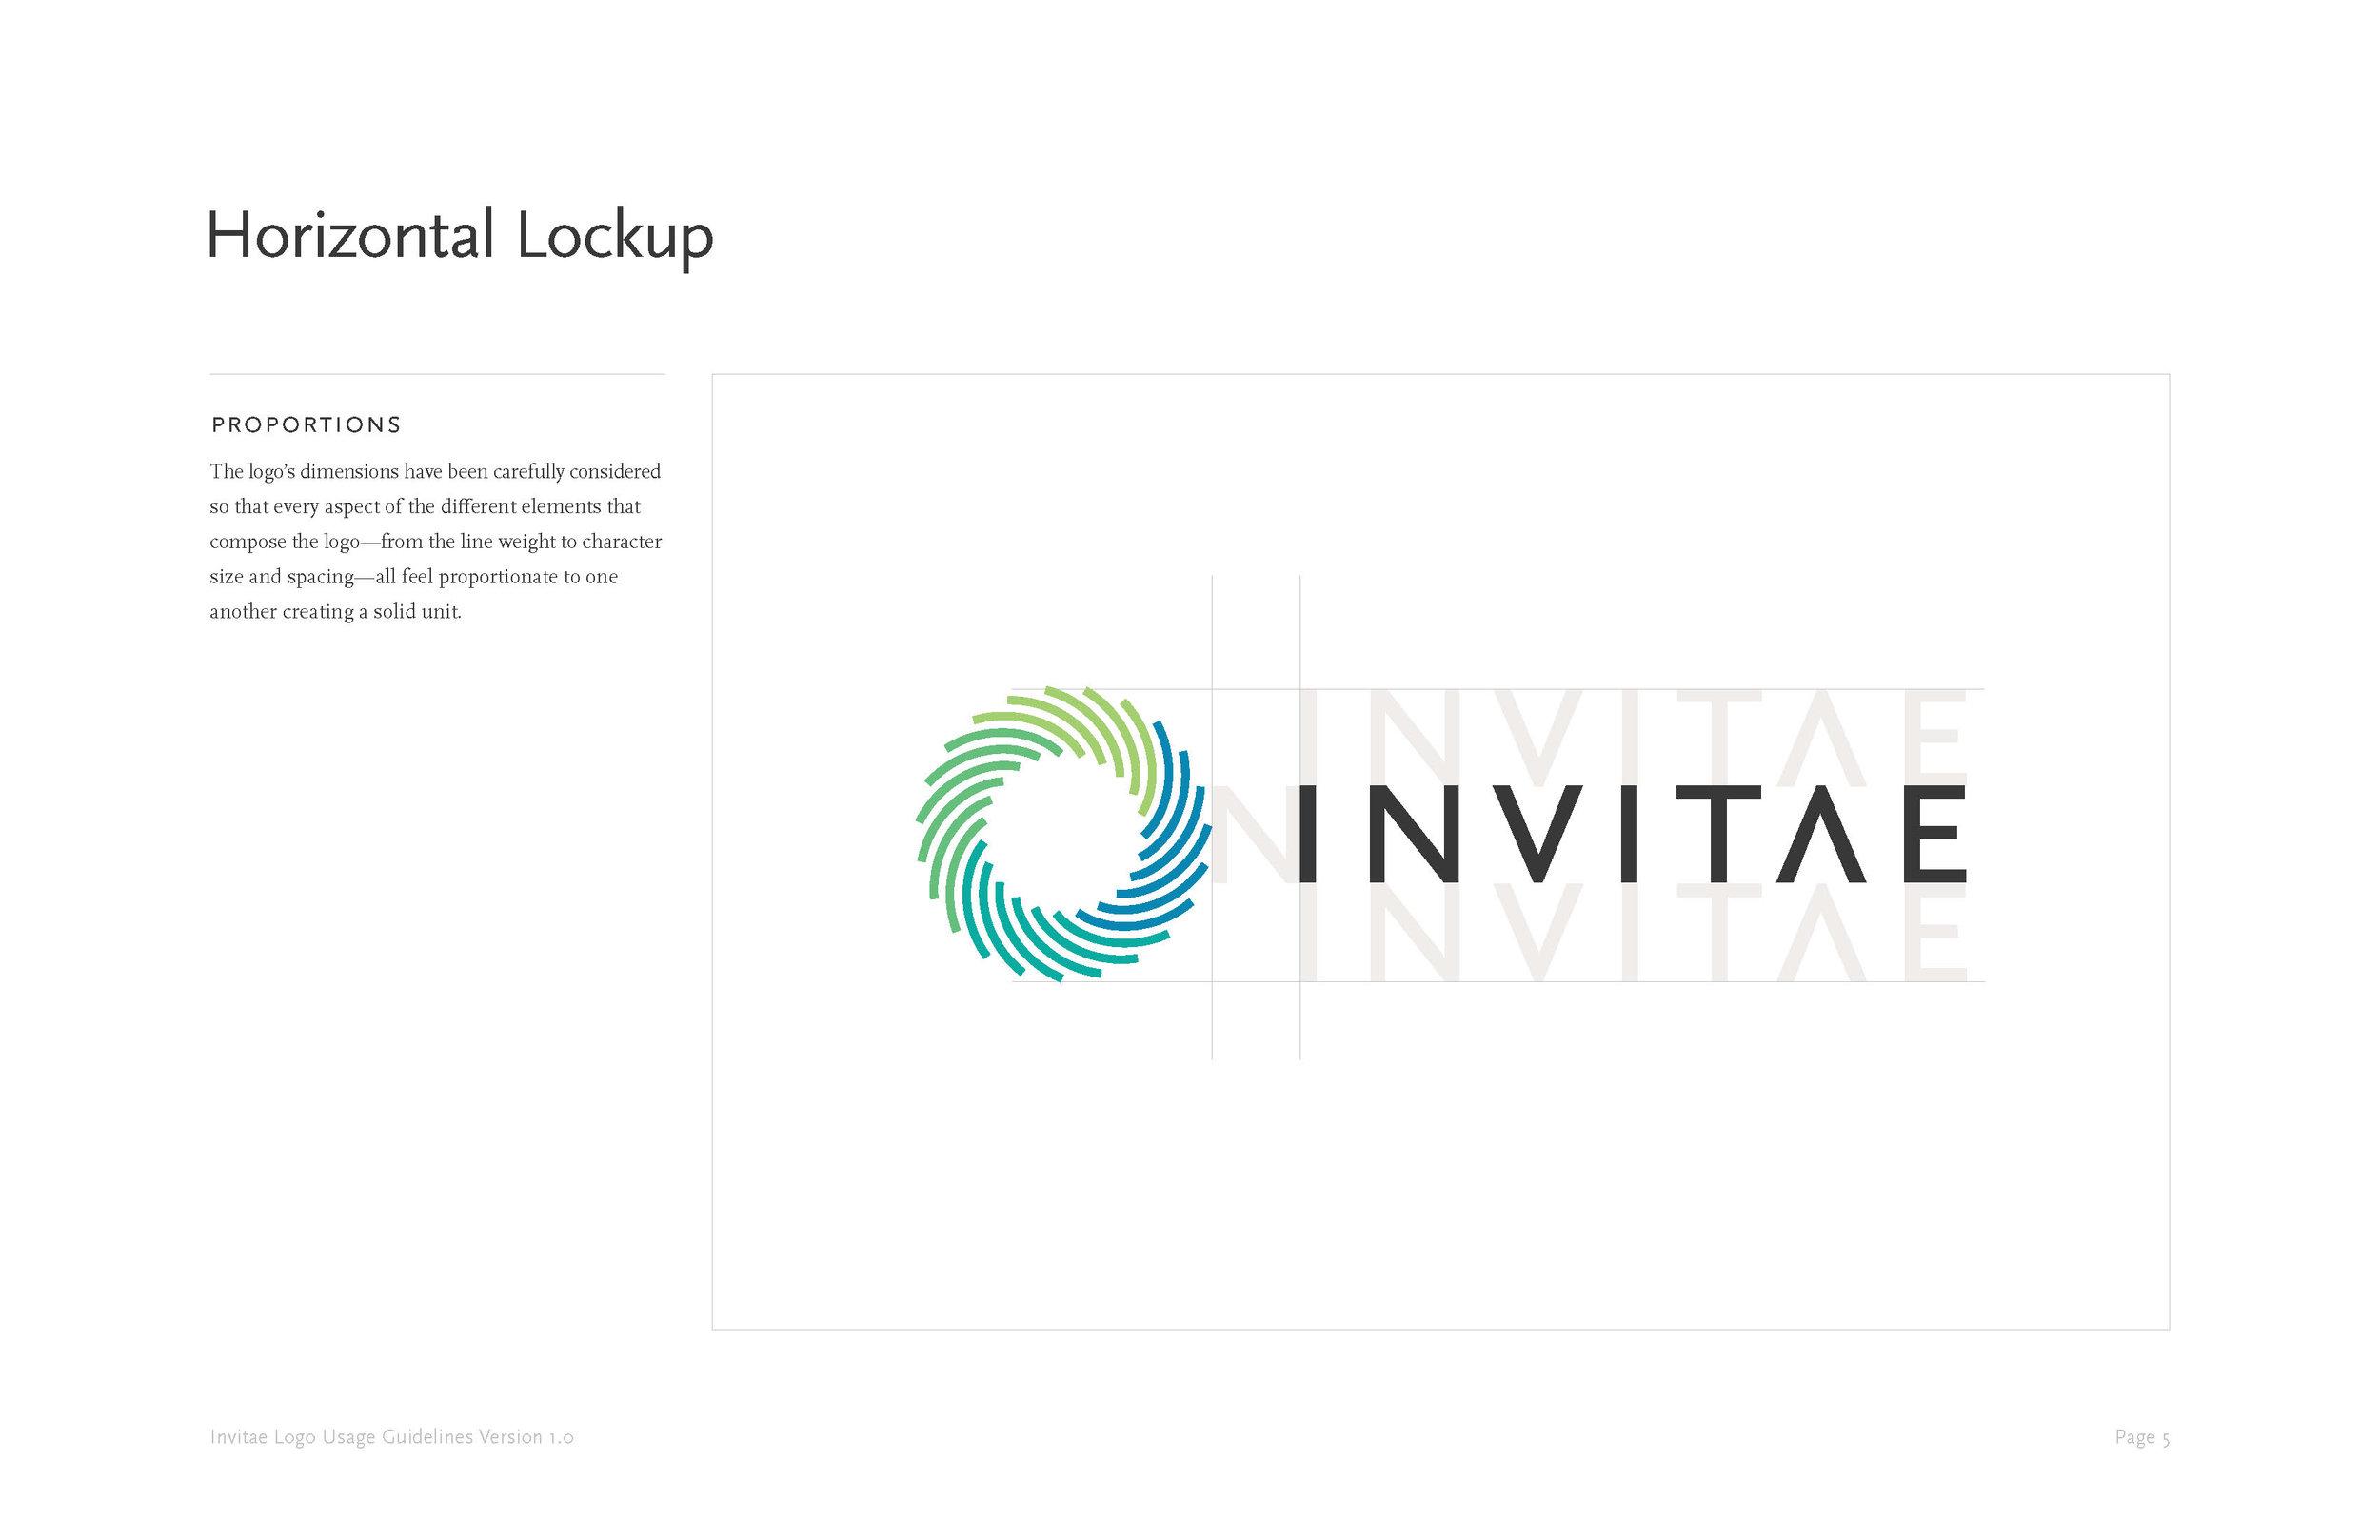 Invitae_logo_guidelines_Page_07.jpg